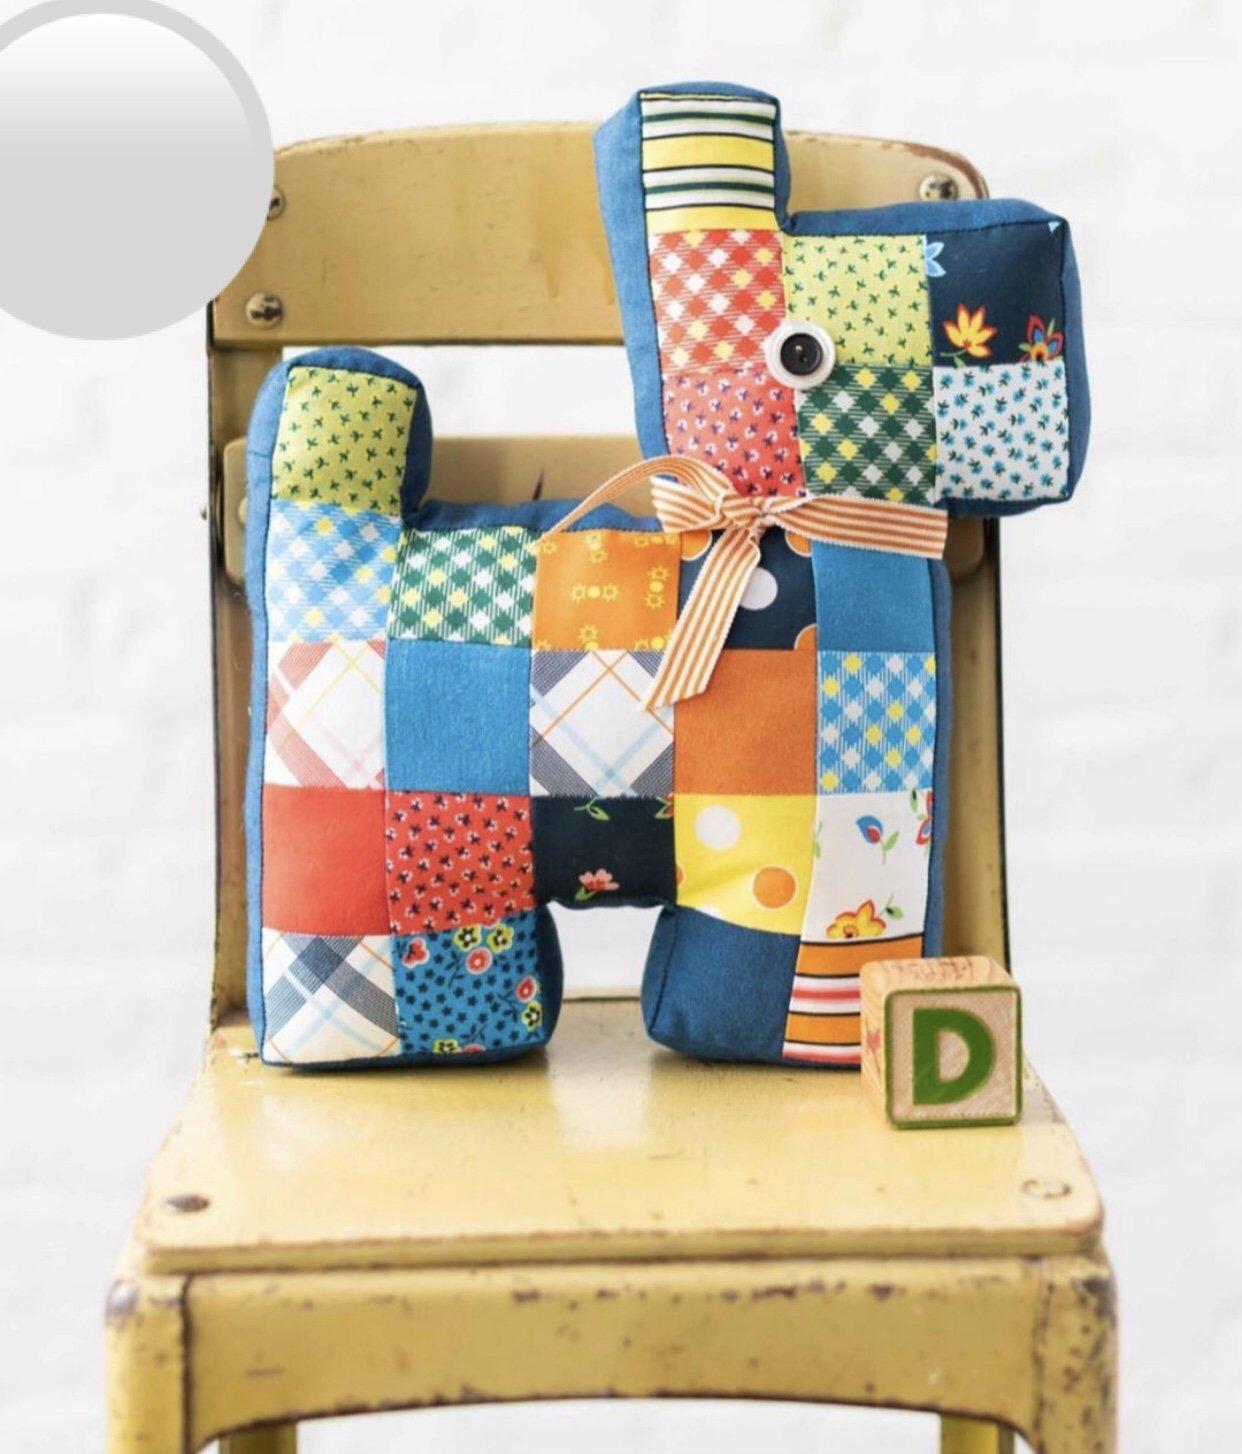 SDKFT Scottie Dog Kit by Denyse Schmidt for Windham Fabrics